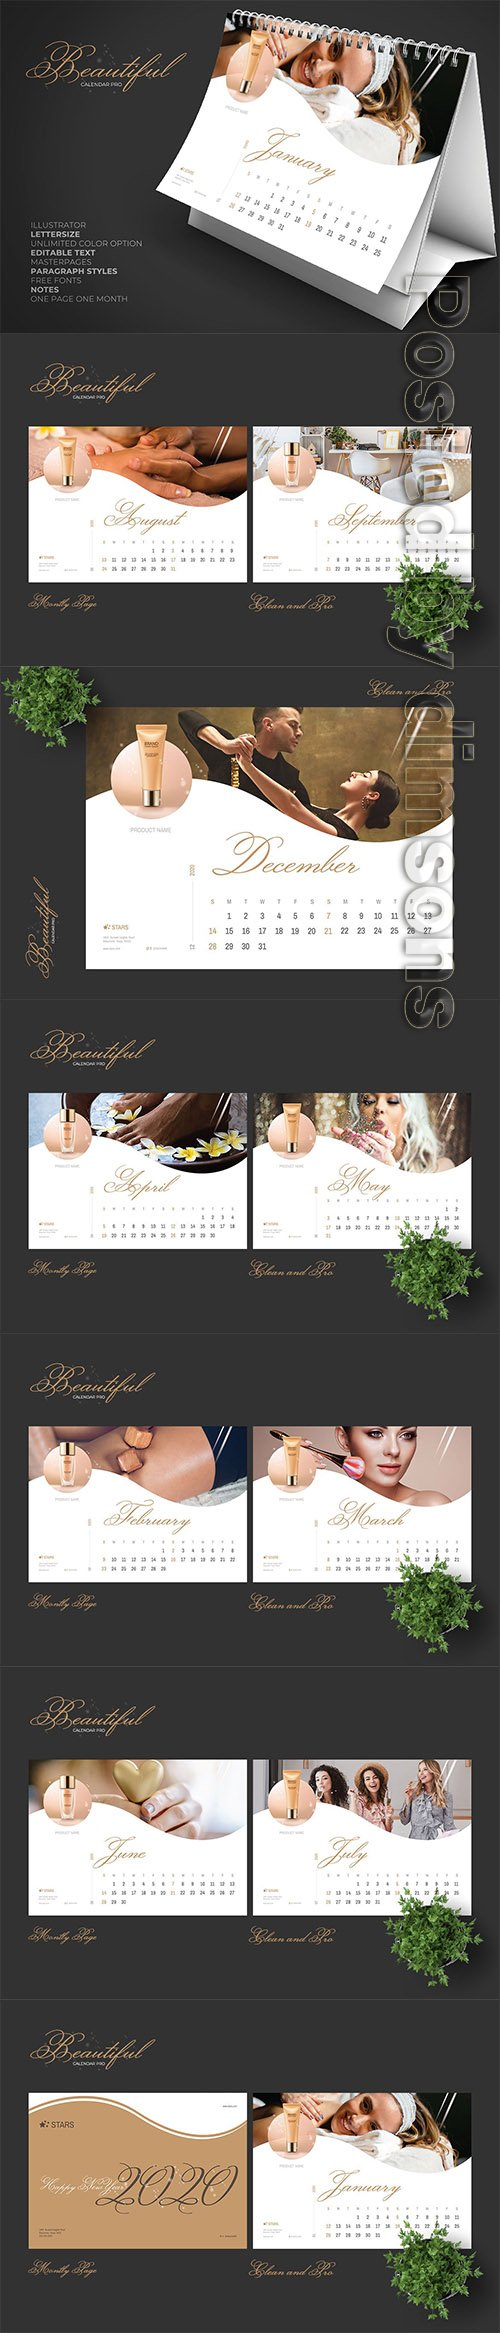 2020 Beauty Creative Calendar Pro